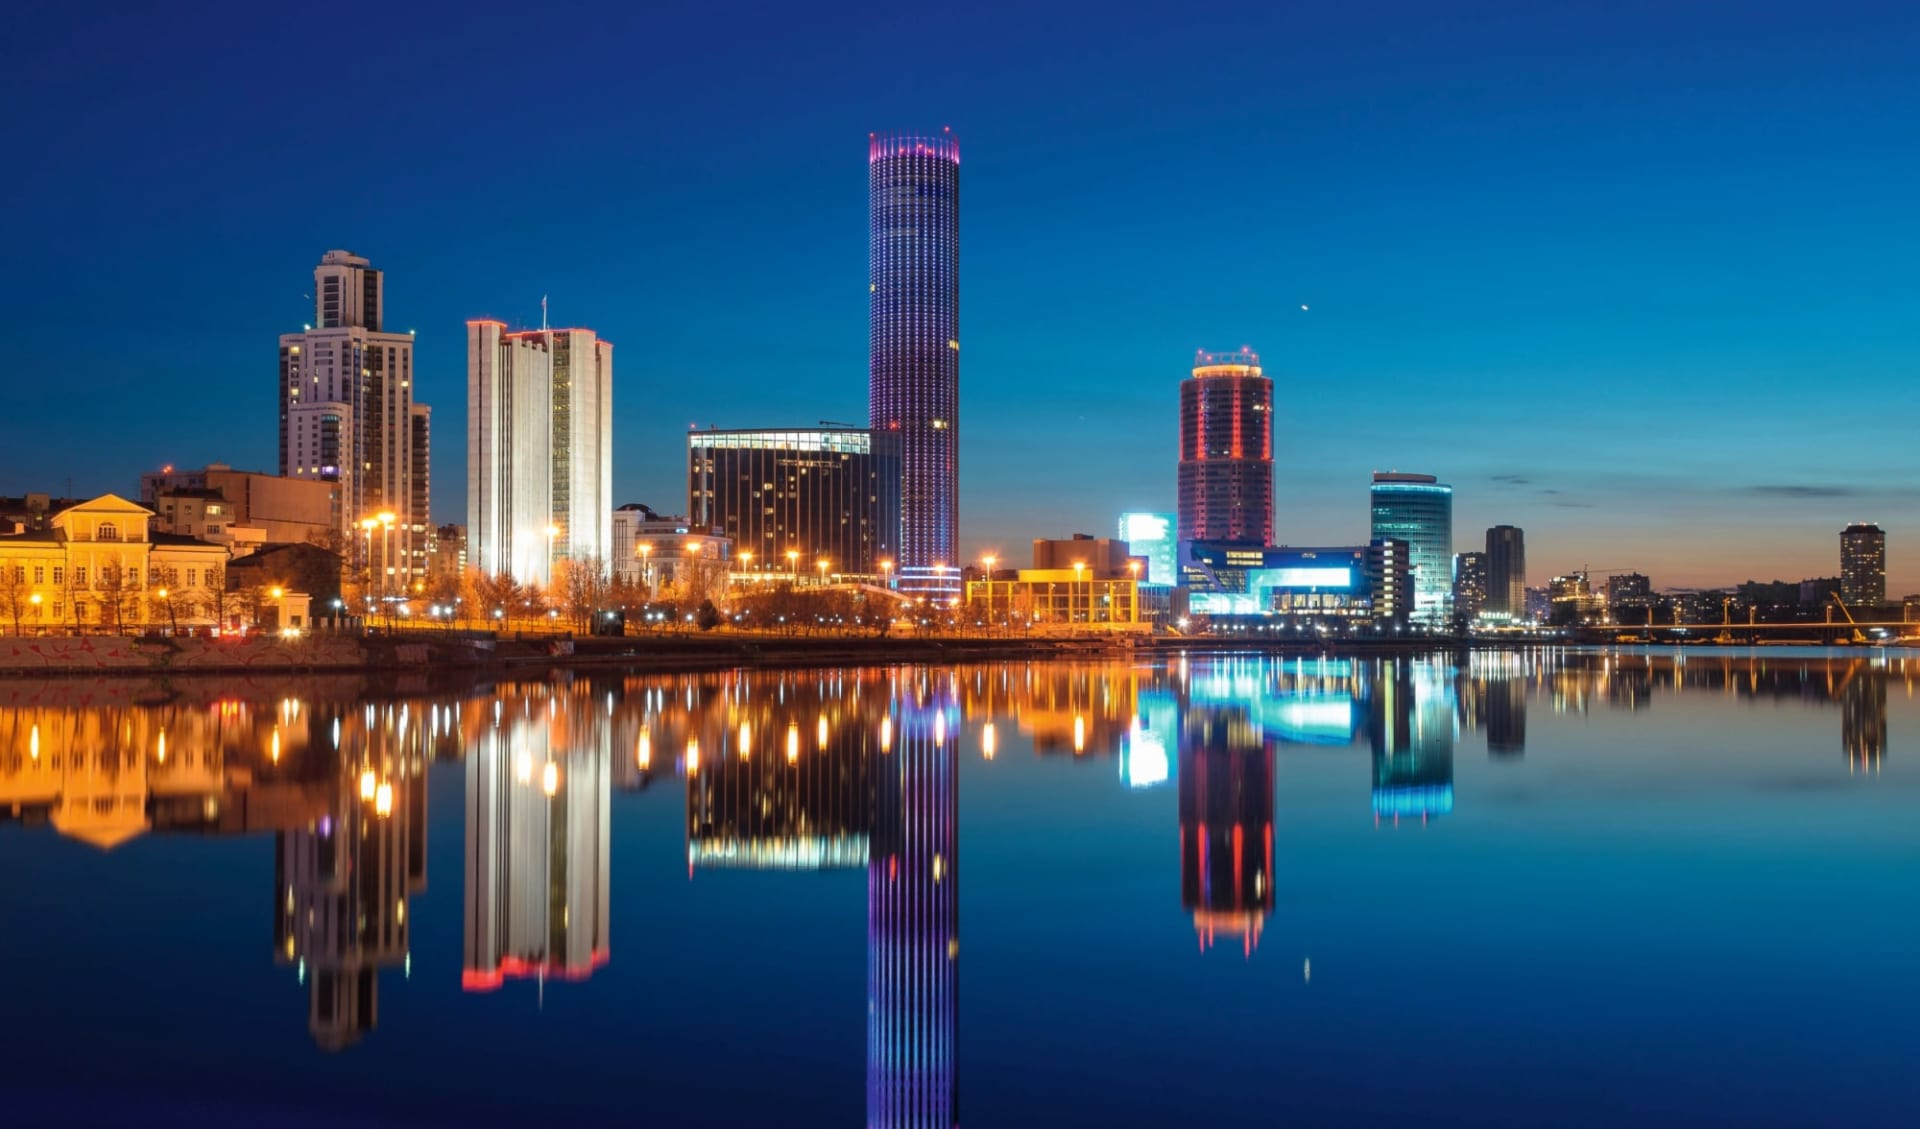 Sonderzug Zarengold Shanghai -Peking-Moskau: Russland_Jekaterinburg_Skyline_Fluss_